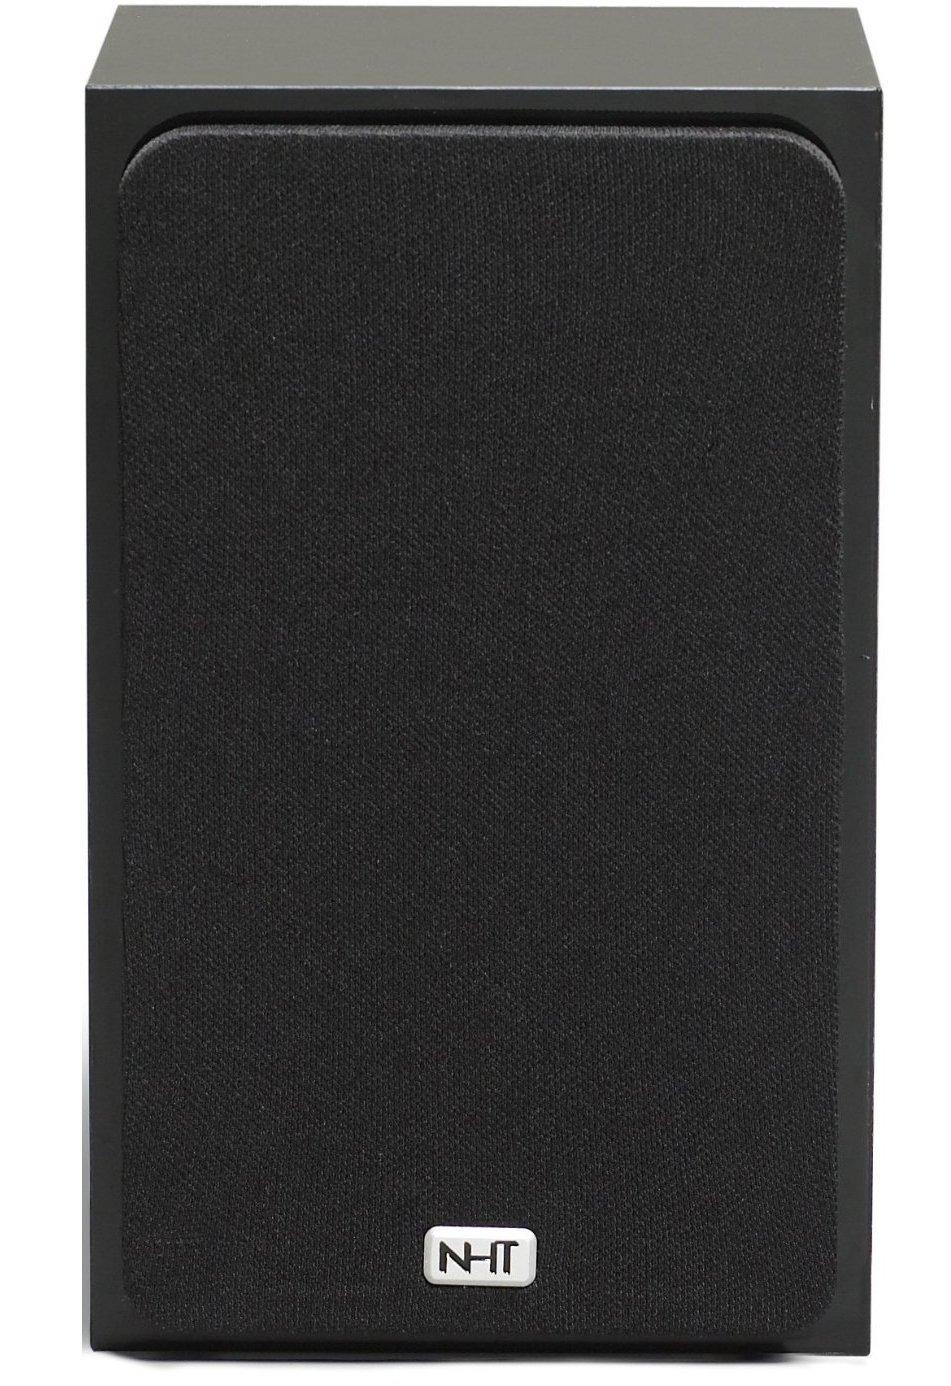 NHT SuperZero 2.1 Mini-Monitor Speaker (Single, Gloss Black) $60